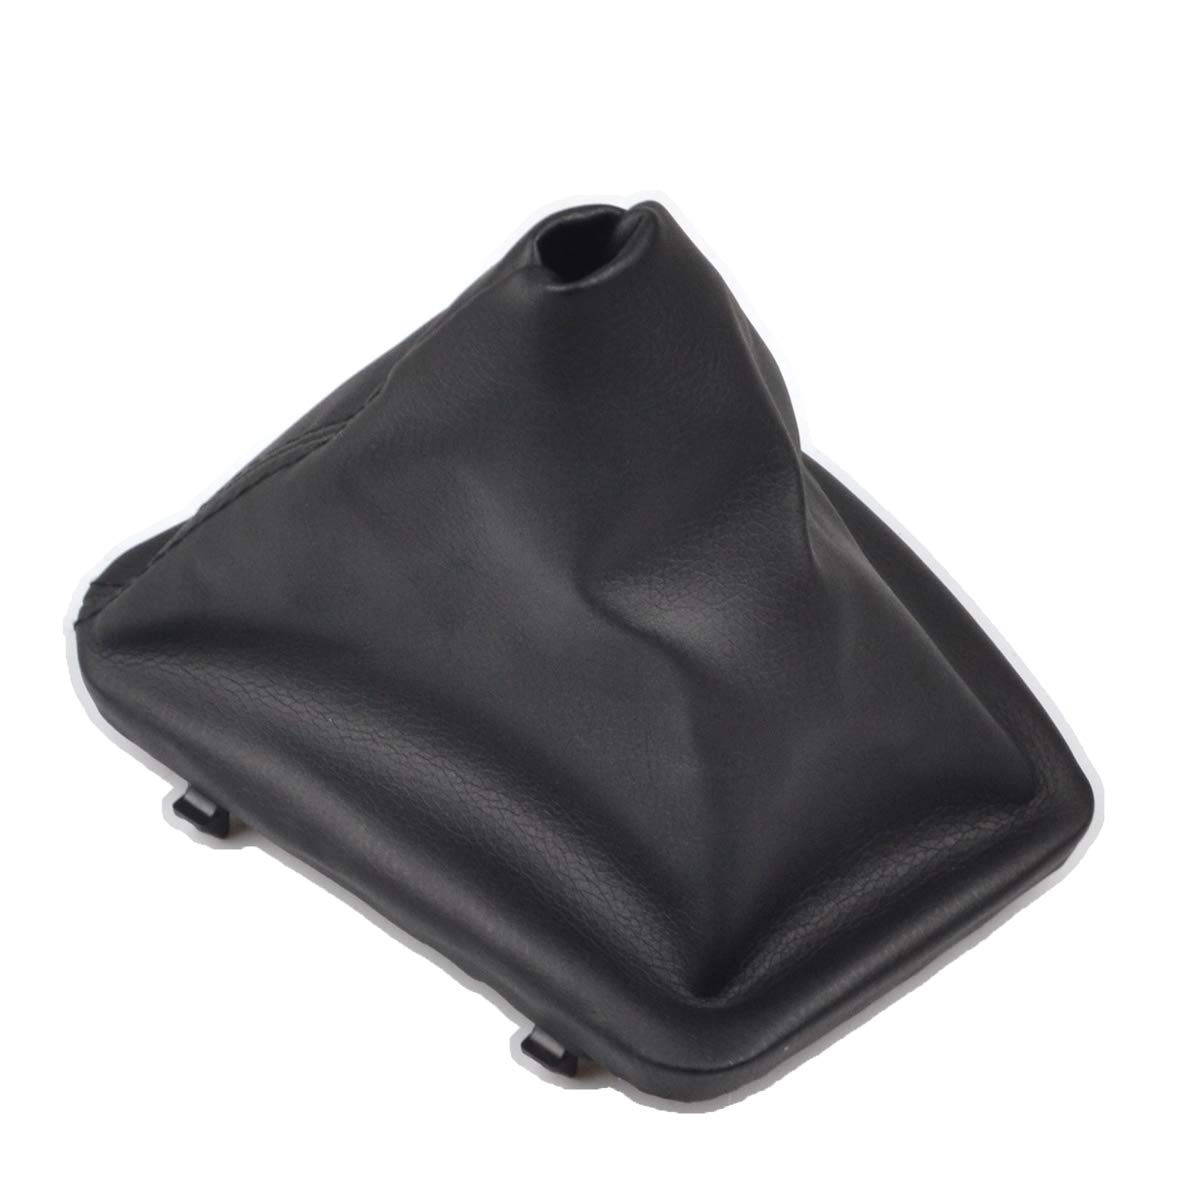 RunQiao Car Interior Accessories PU Gear Stick Shift Konb Gaiter Boot Cover with Frame for E46